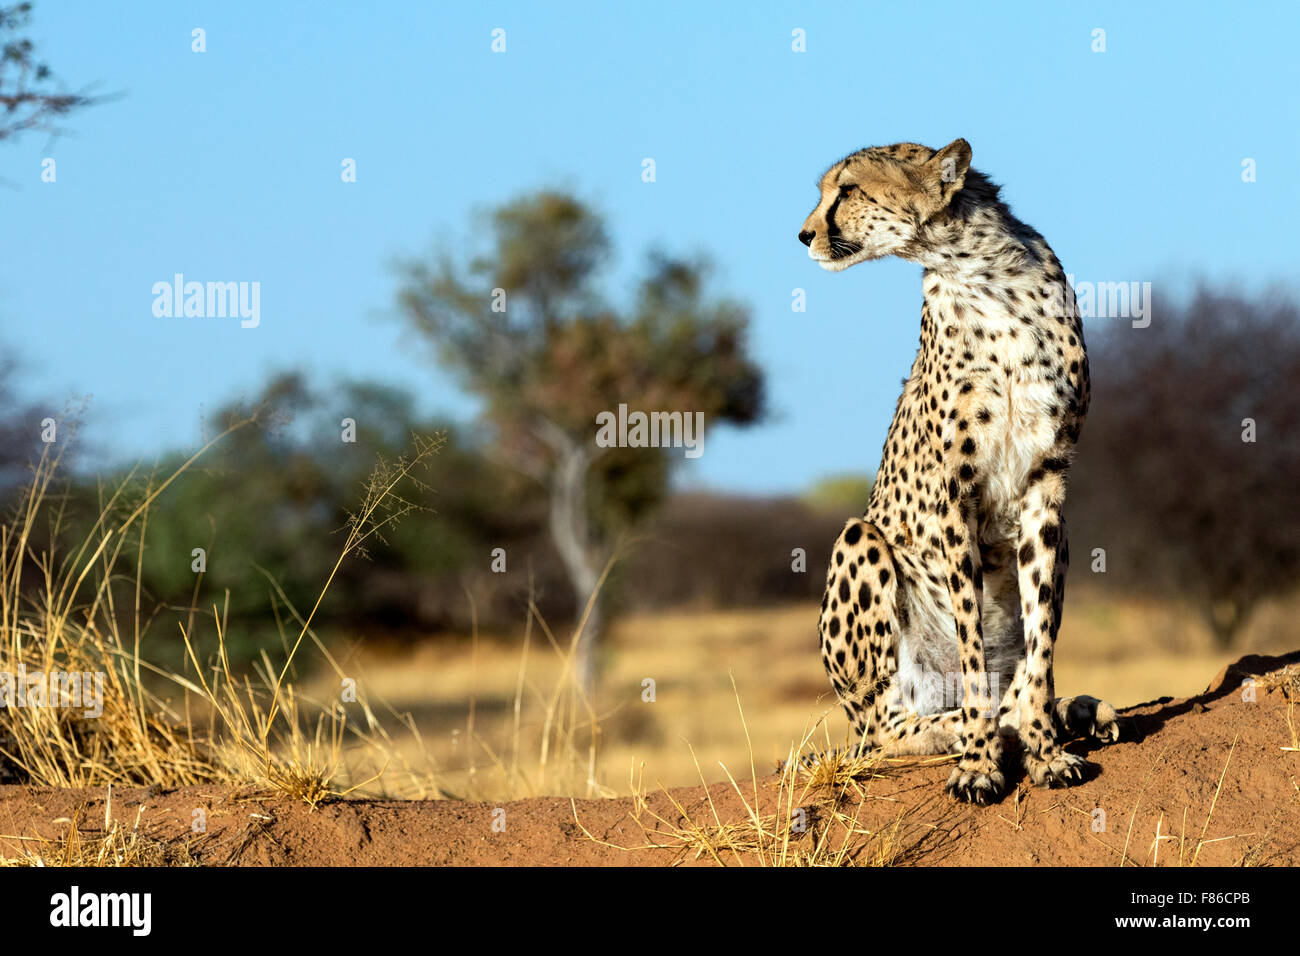 Gepard (Acinonyx Jubatus) [Gefangenen] - Africat Rehabilitation Heiligtum, Okonjima, Namibia, Afrika Stockbild